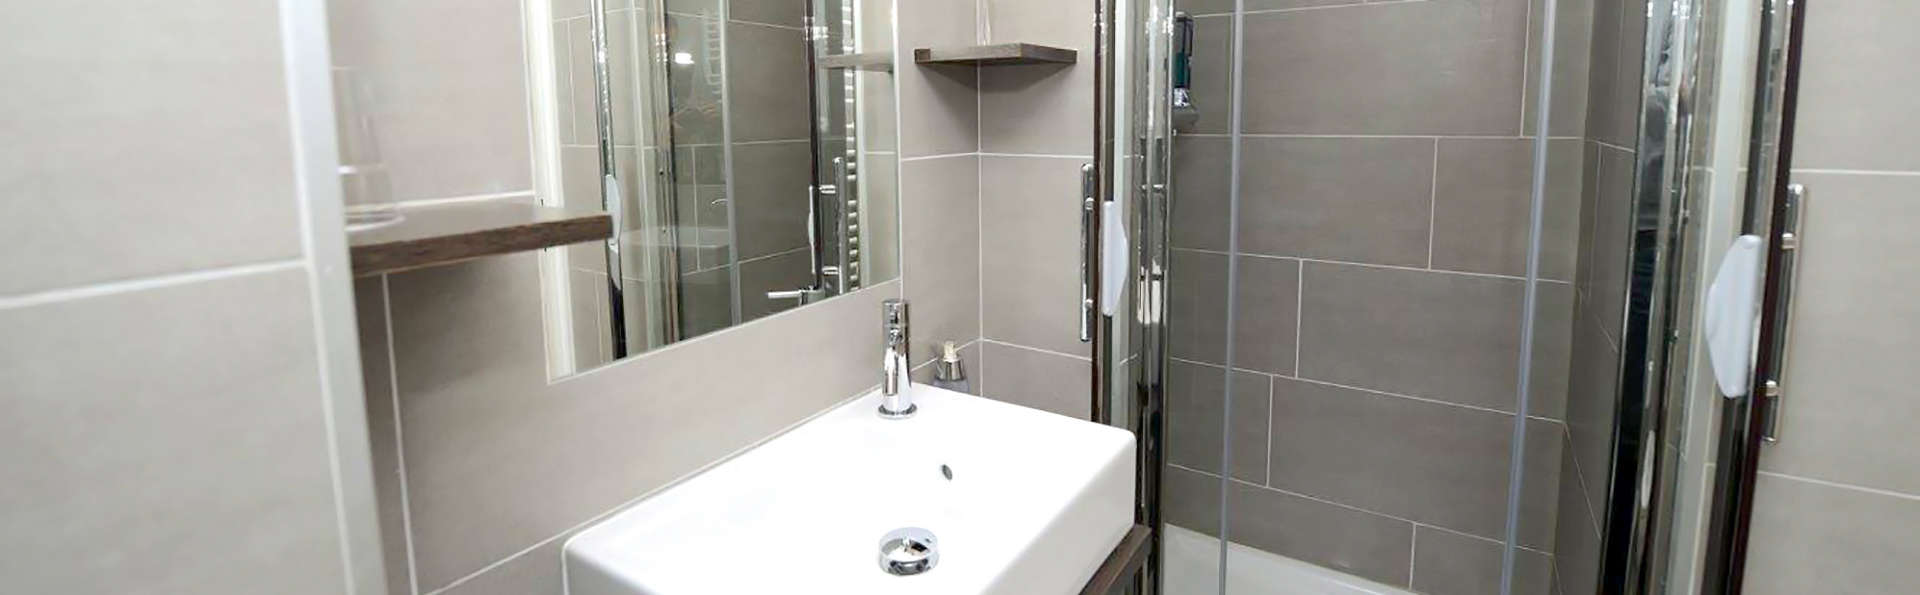 Hôtel Valpre - Edit_Bathroom.jpg